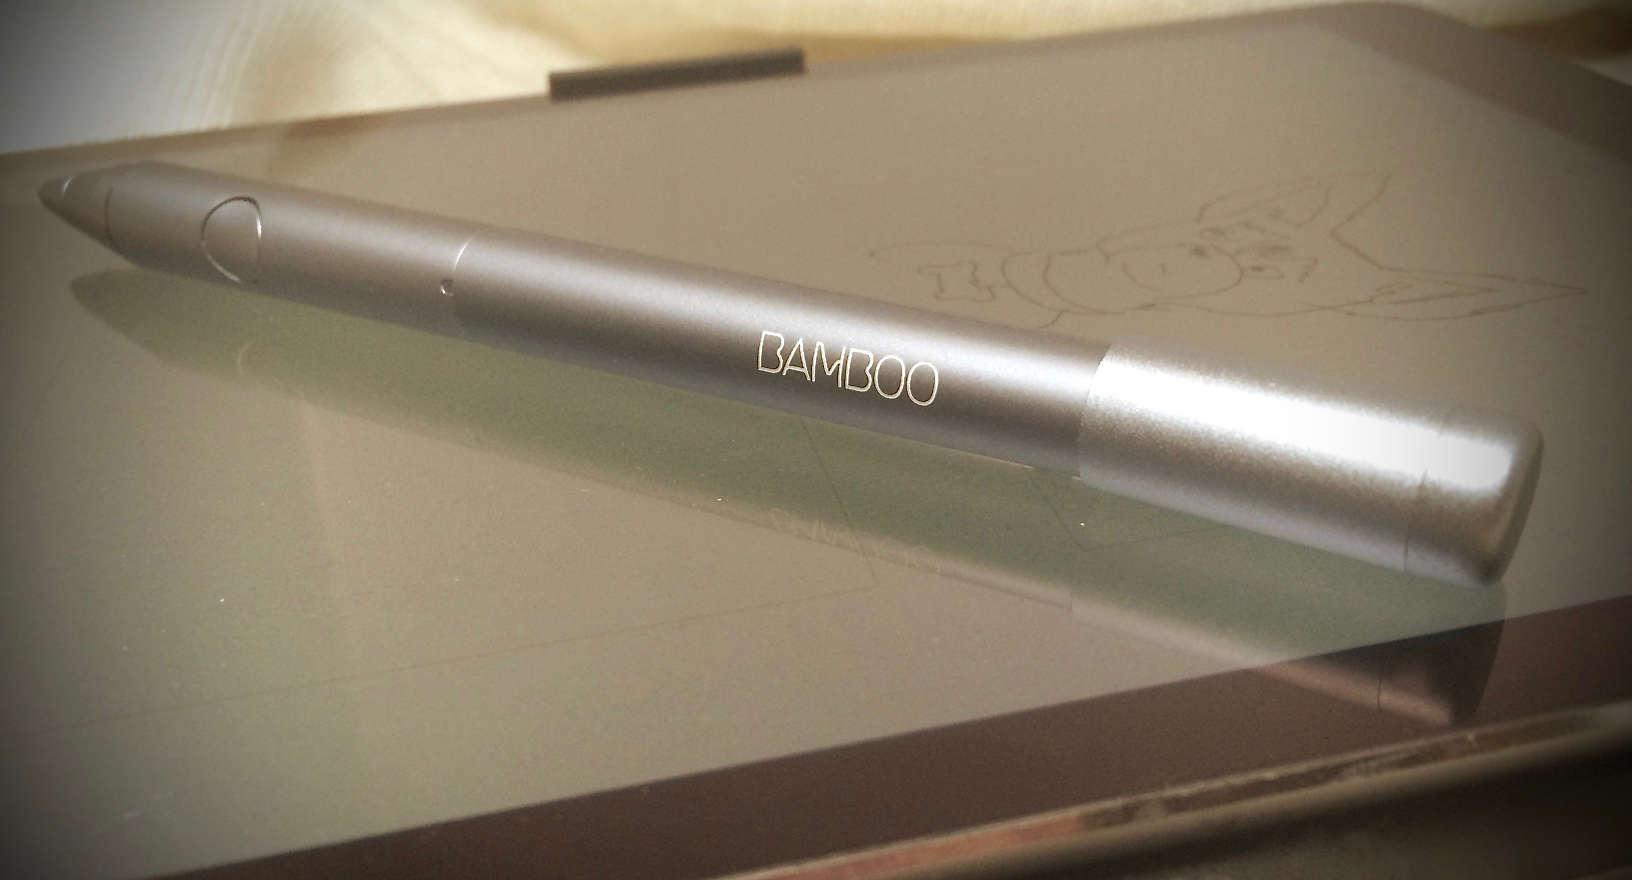 Bamboo Fineline Stylus 1